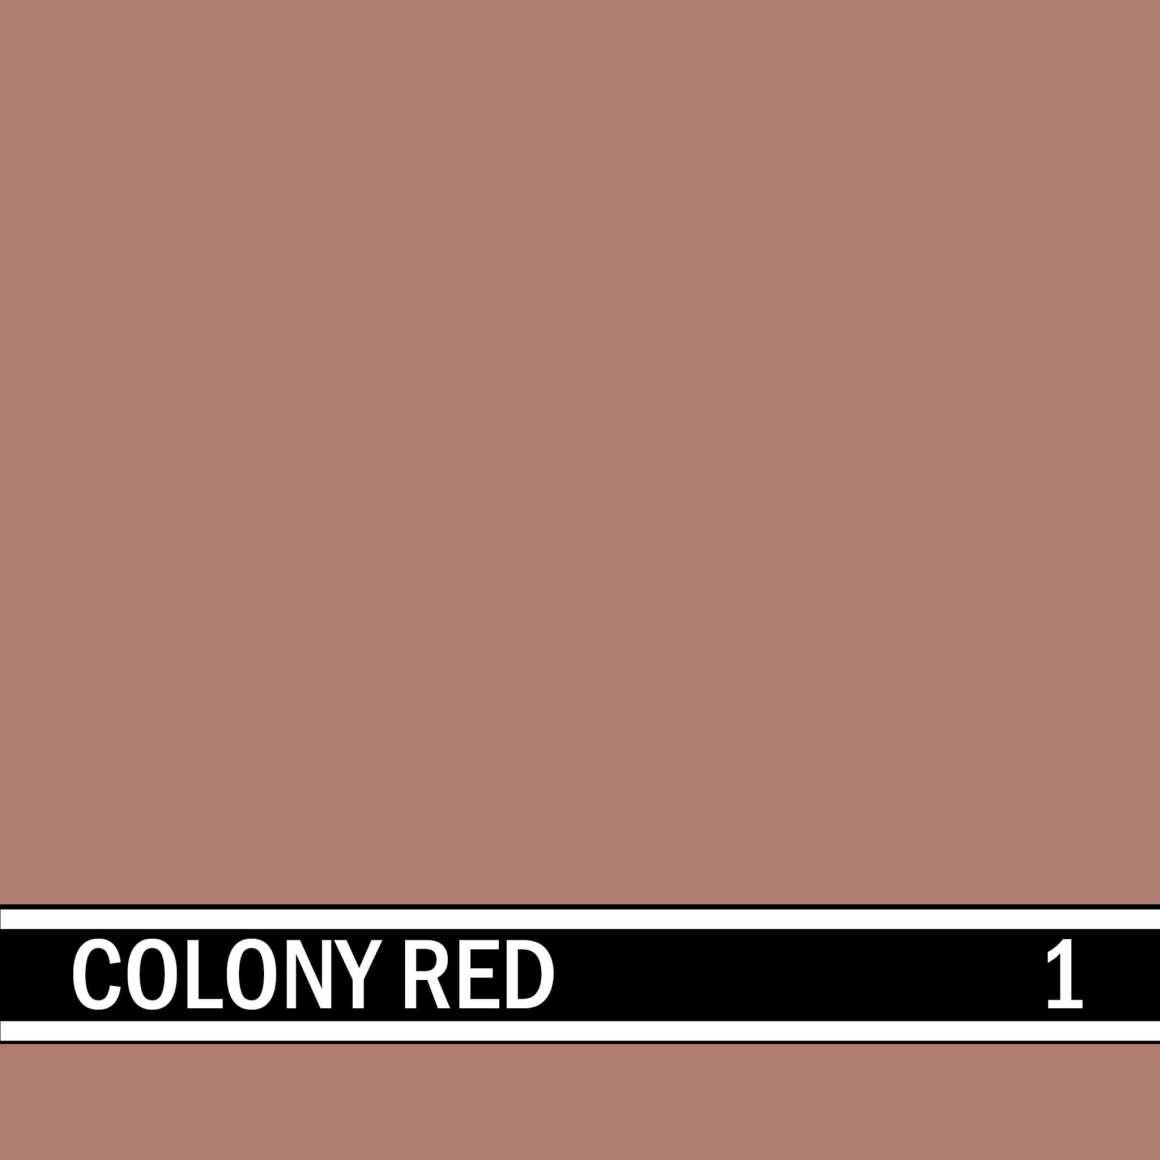 Colony Red integral concrete color for stamped concrete and decorative colored concrete